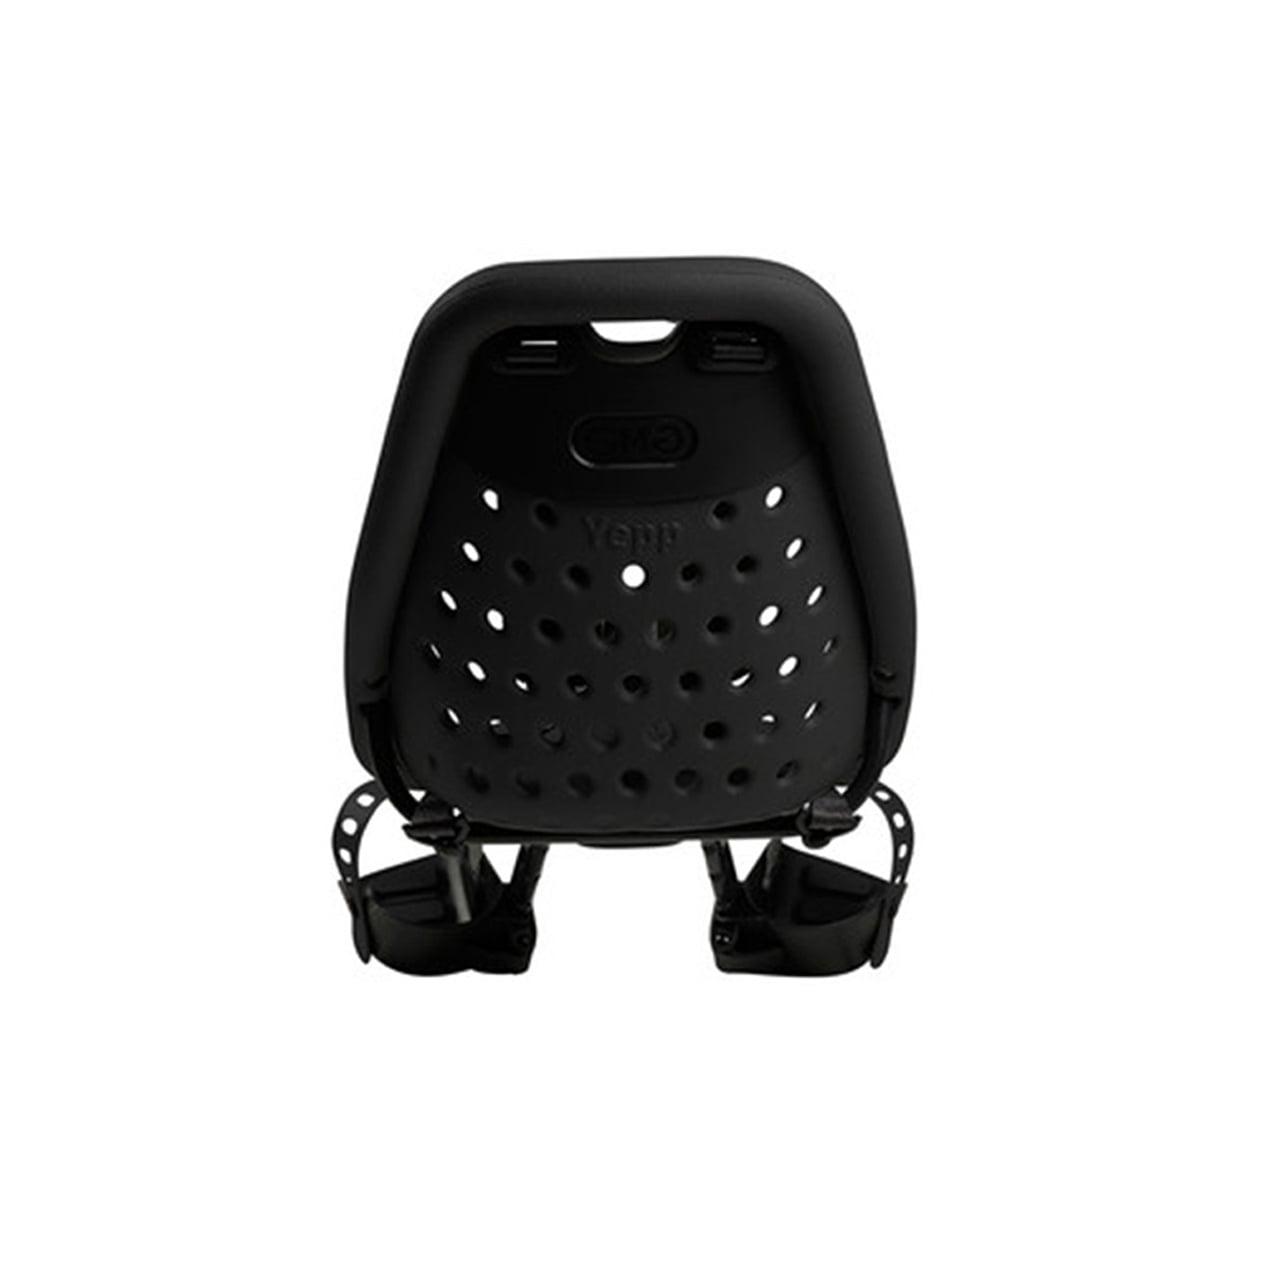 Scaun pentru copii cu montare pe bicicleta in fata Thule Yepp Mini Black 3